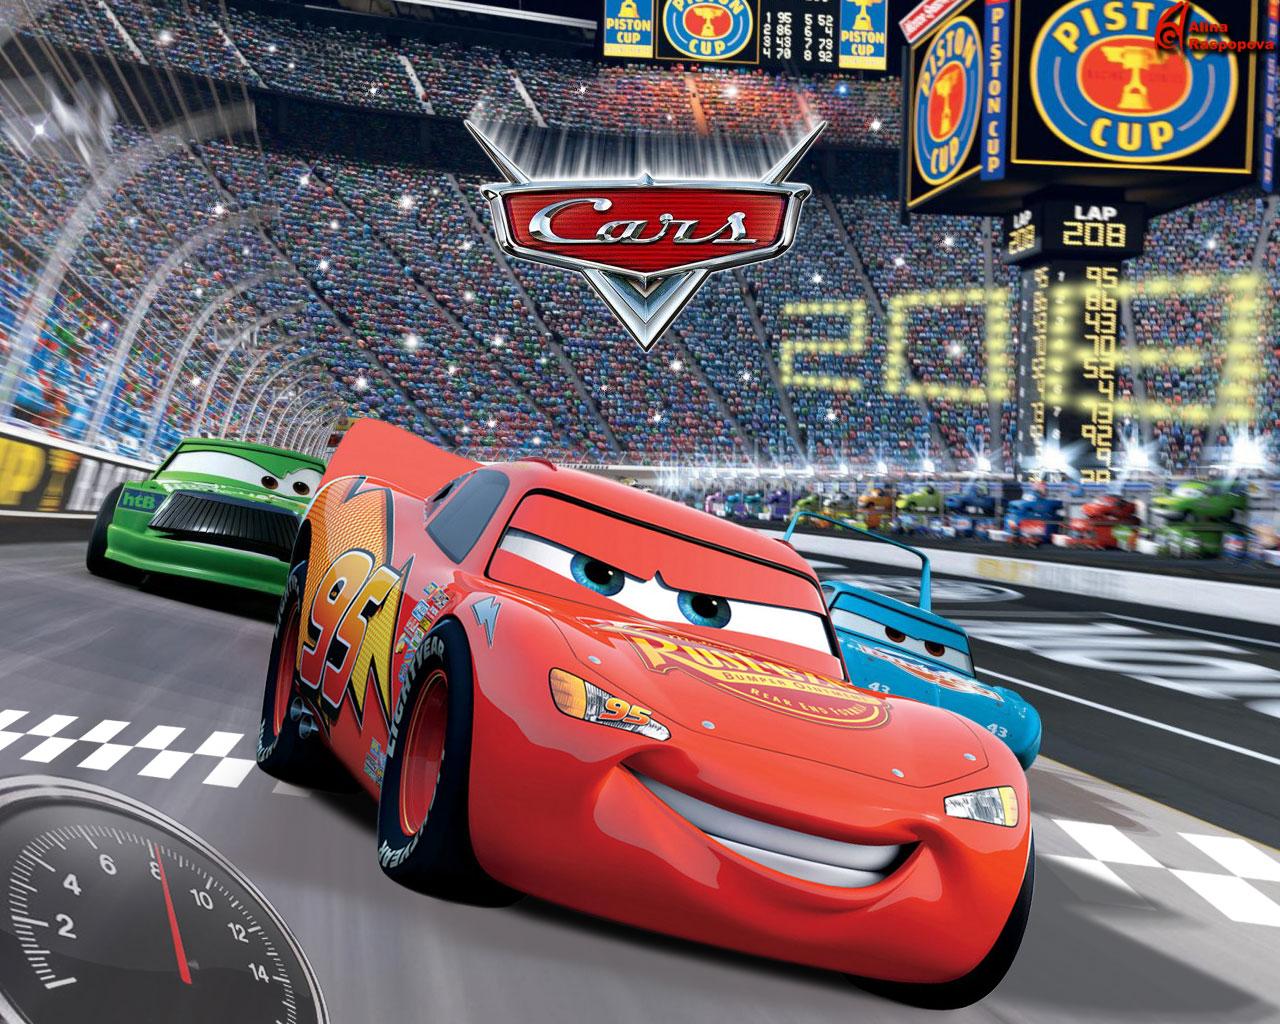 73 Wallpaper Cars Cartoon On Wallpapersafari